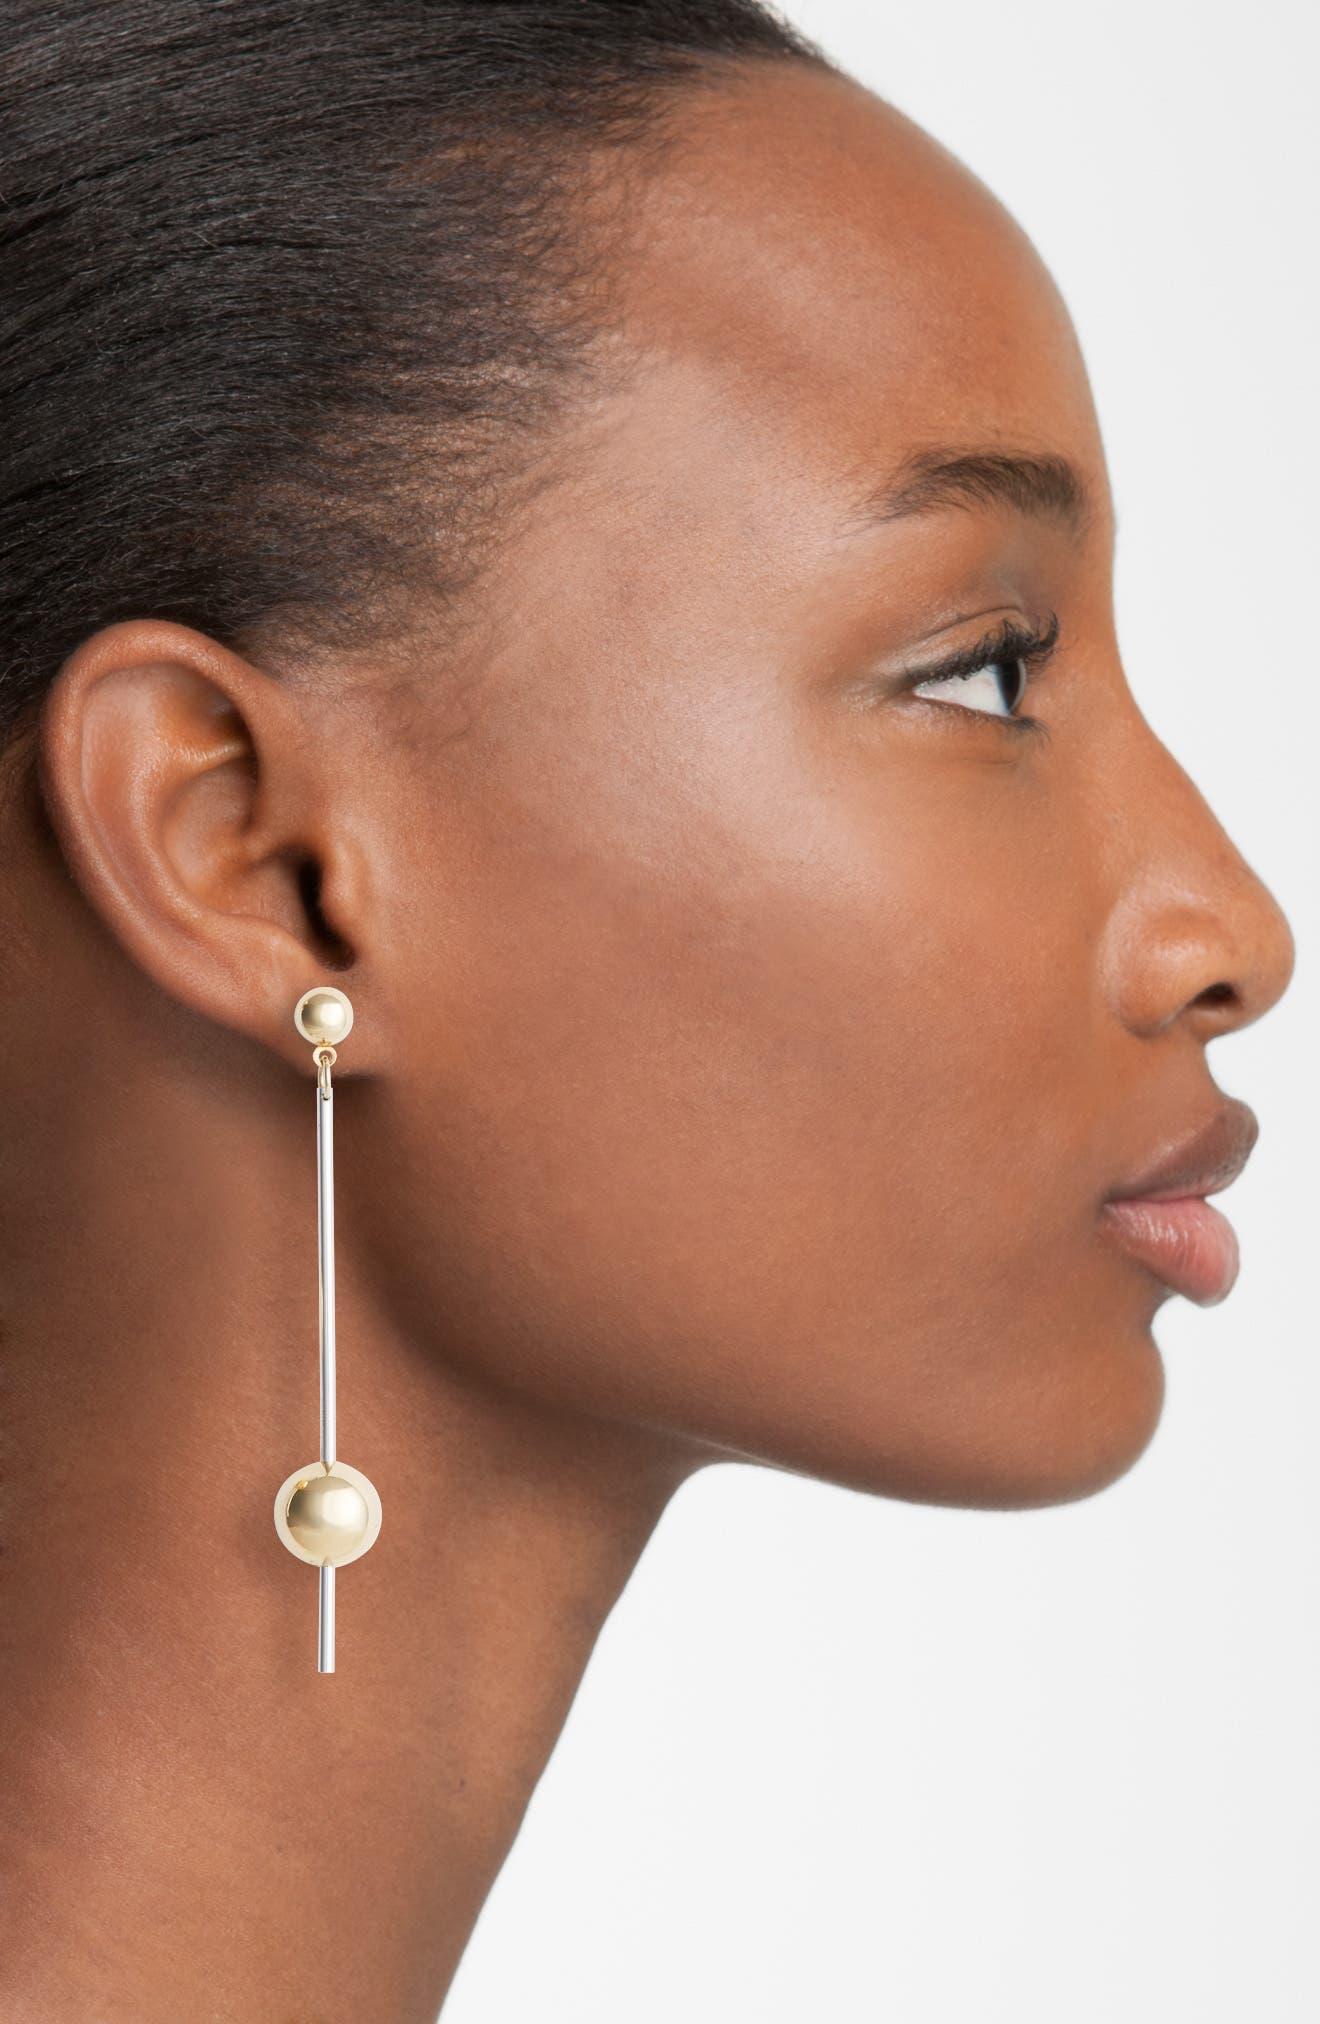 Stick Ball Earrings,                             Alternate thumbnail 3, color,                             Silver / Gold